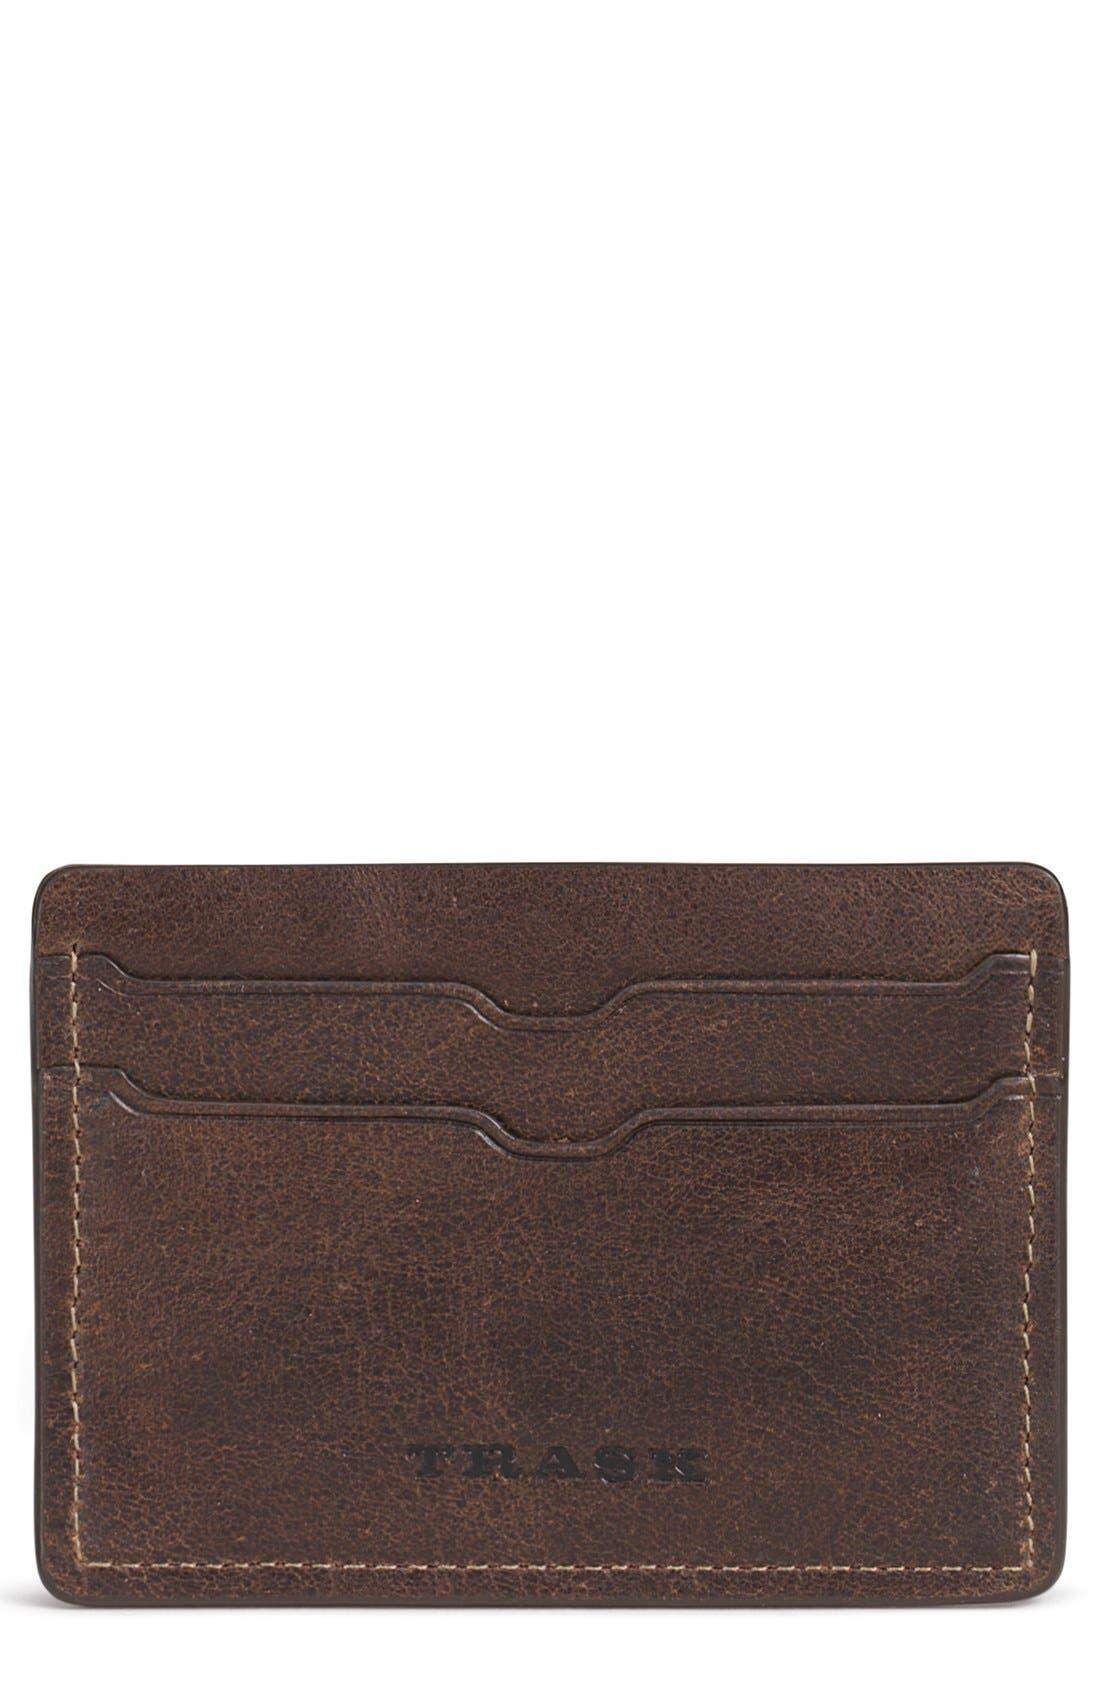 Main Image - Trask 'Jackson' Bison Leather Card Case